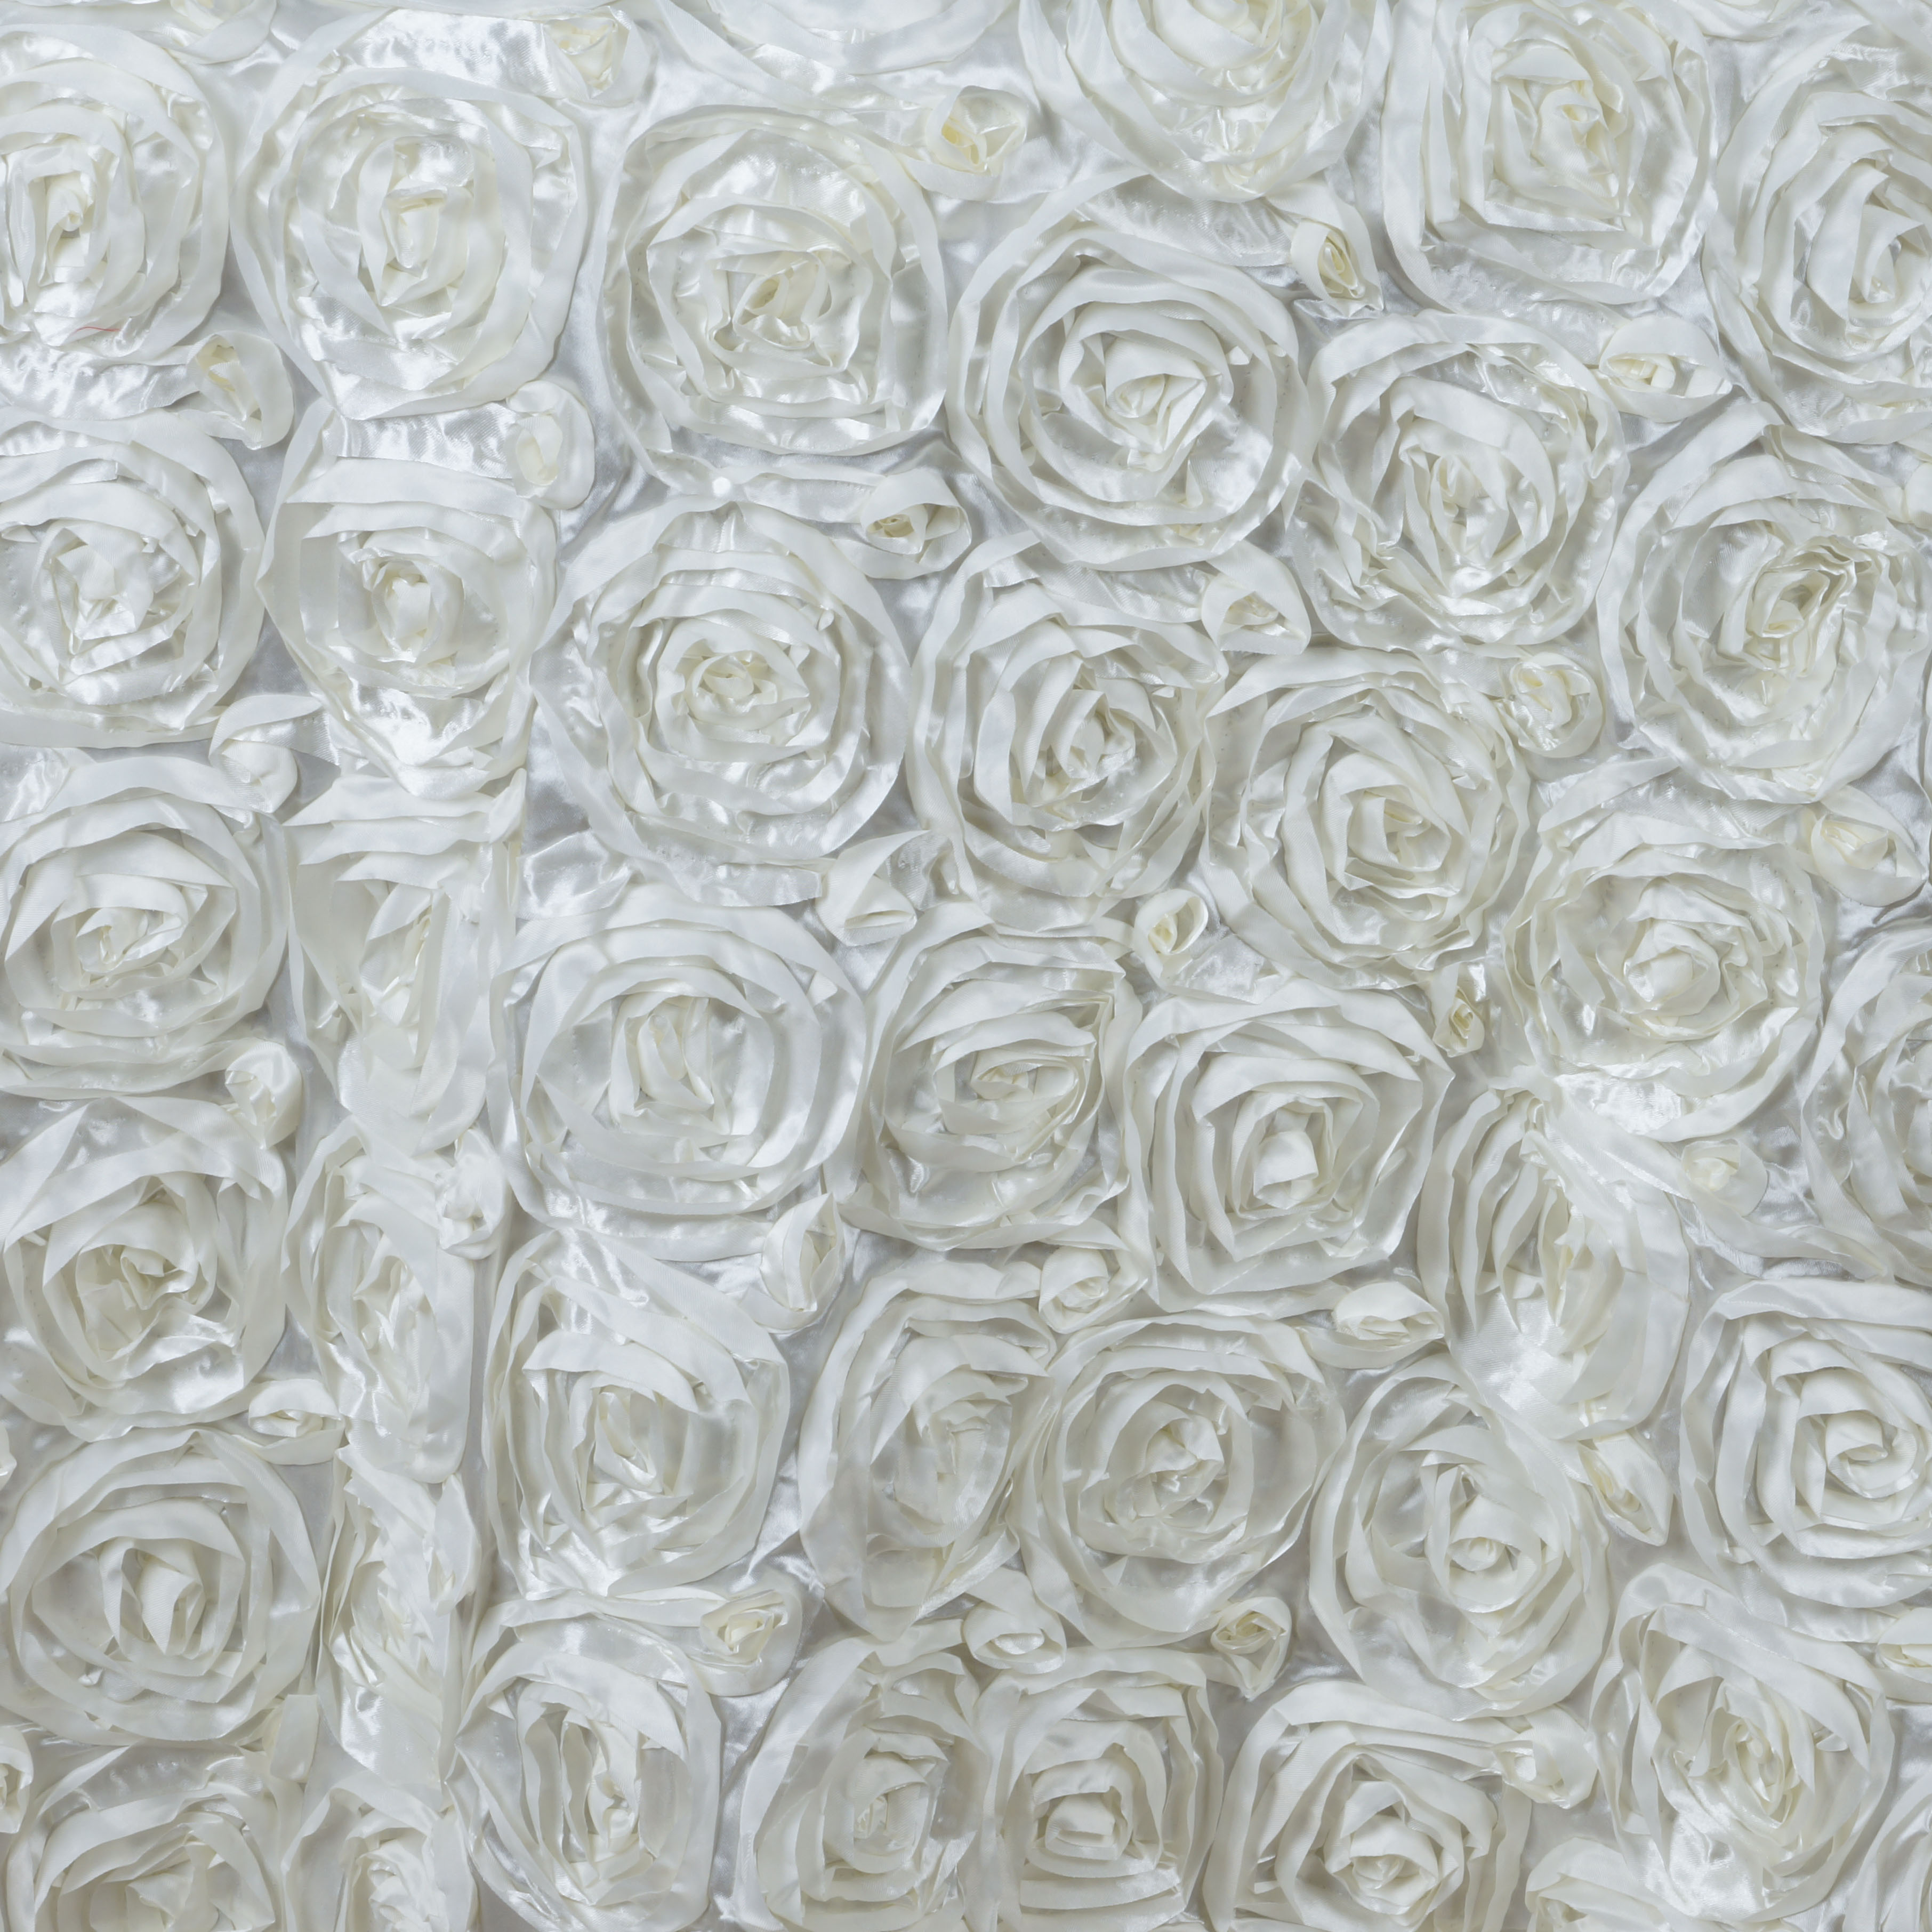 Rosette Rose Pattern Round Tablecloth eBay : tab01120ivr3 from www.ebay.com size 3624 x 3624 jpeg 1209kB